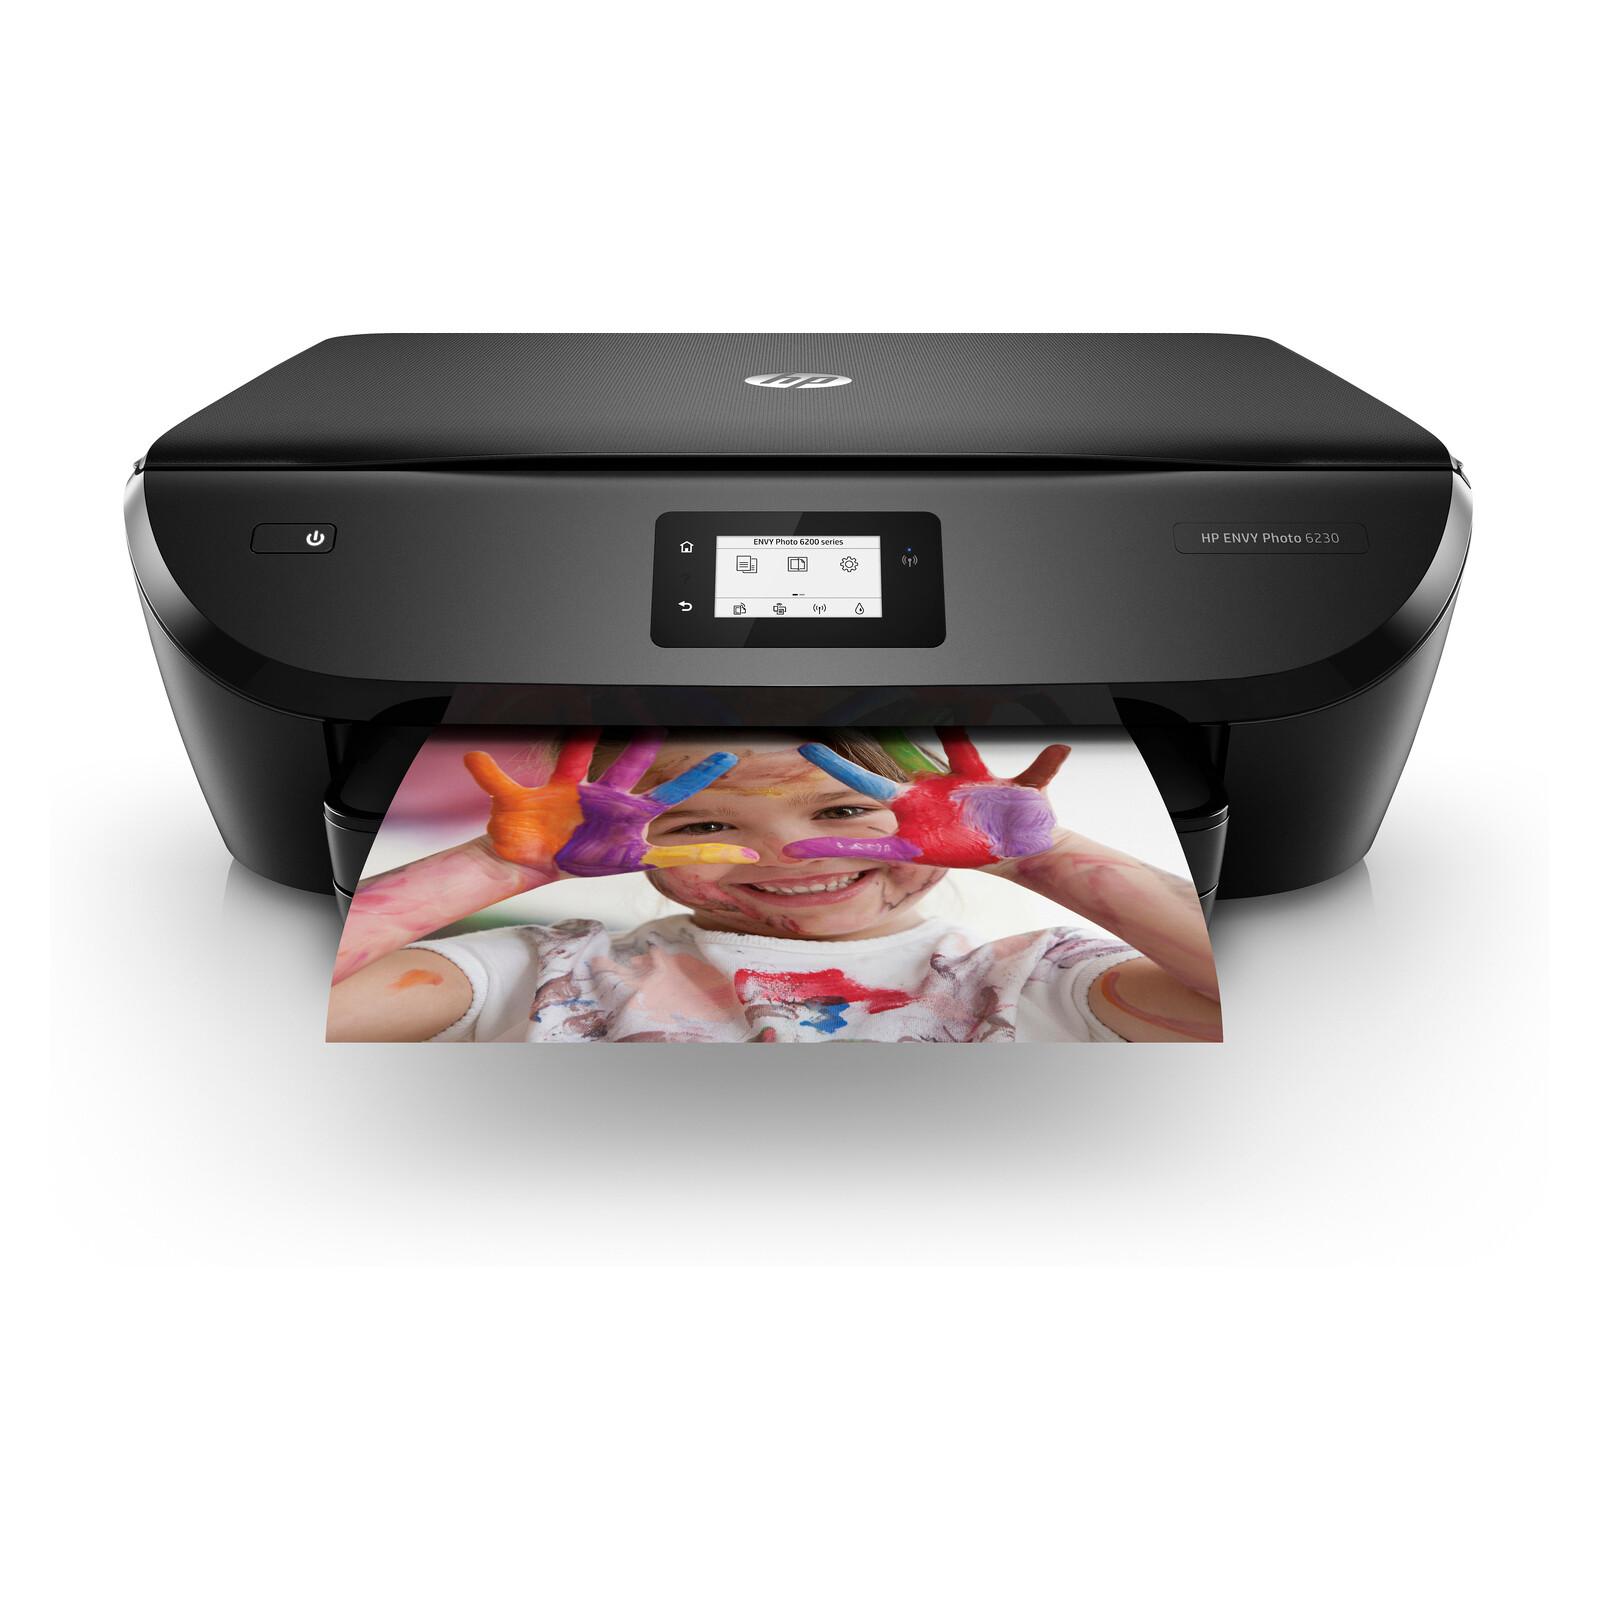 HP ENVY Photo 6230 All-in-one Drucker - Drucken, Kopieren, S